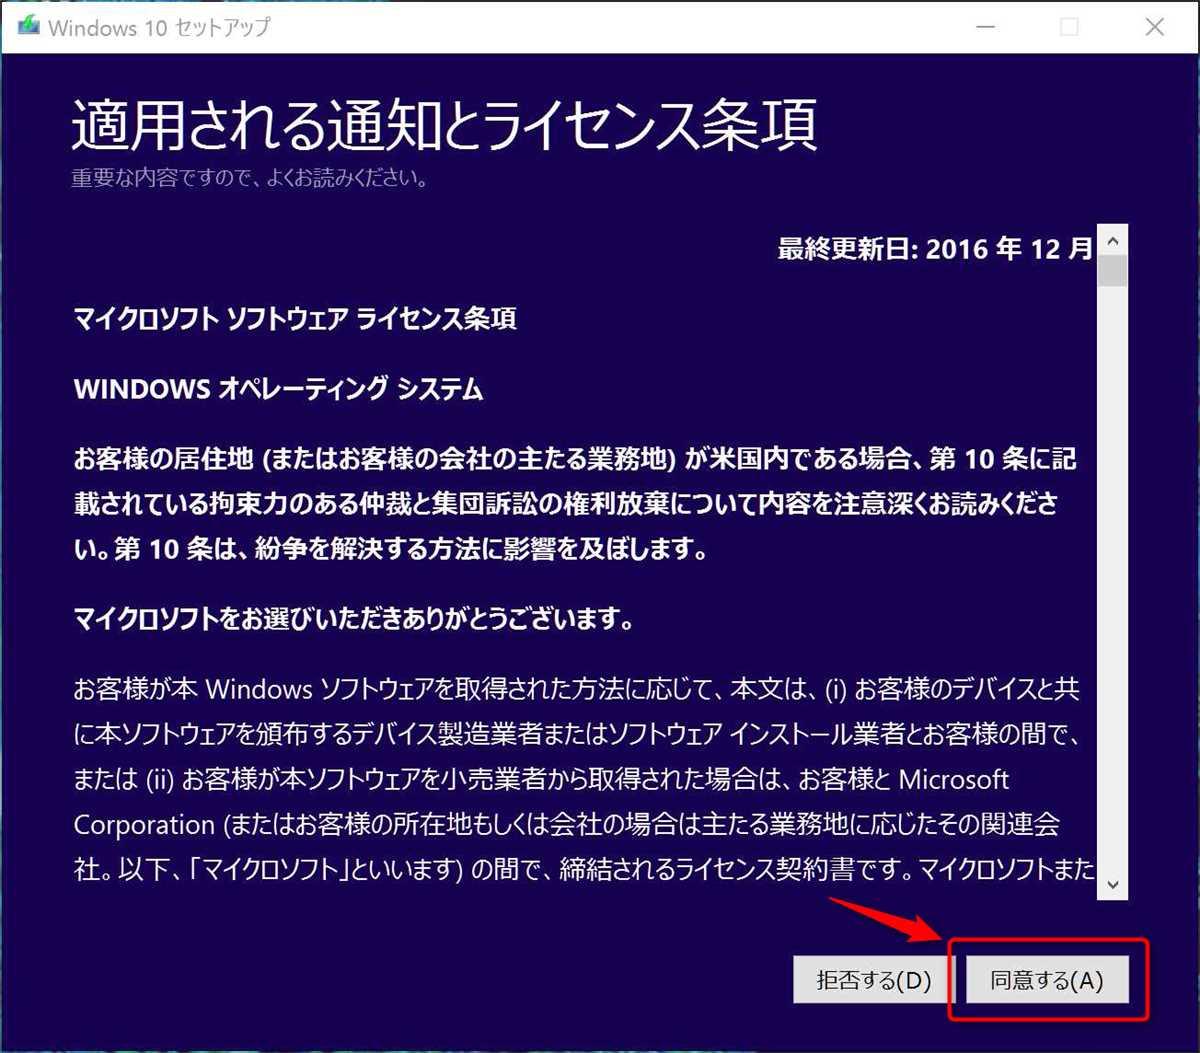 Apply Windows 10 Creators Update manually - 3